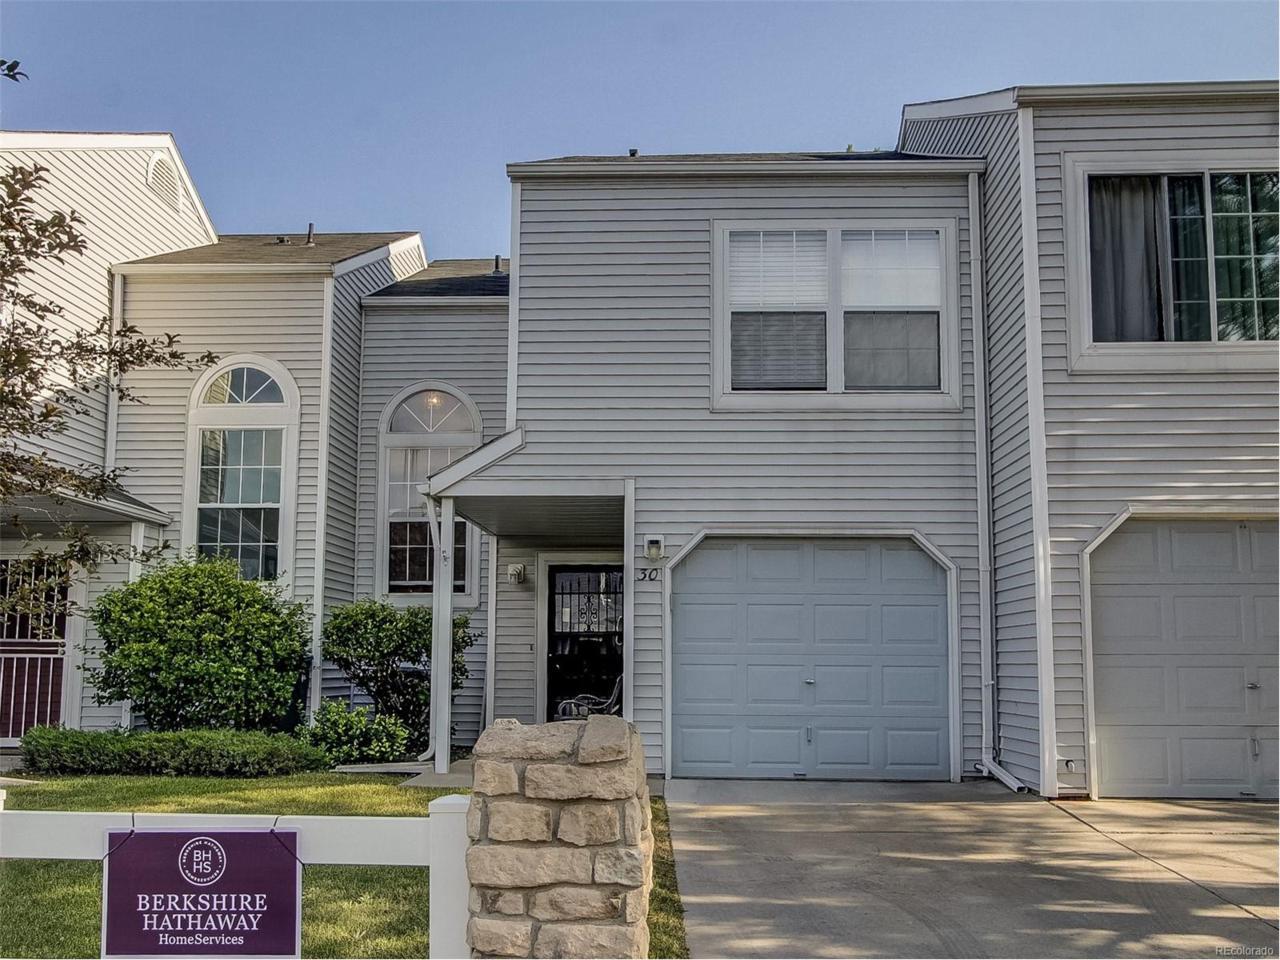 12322 Colorado Boulevard #30, Thornton, CO 80241 (MLS #4590107) :: 8z Real Estate